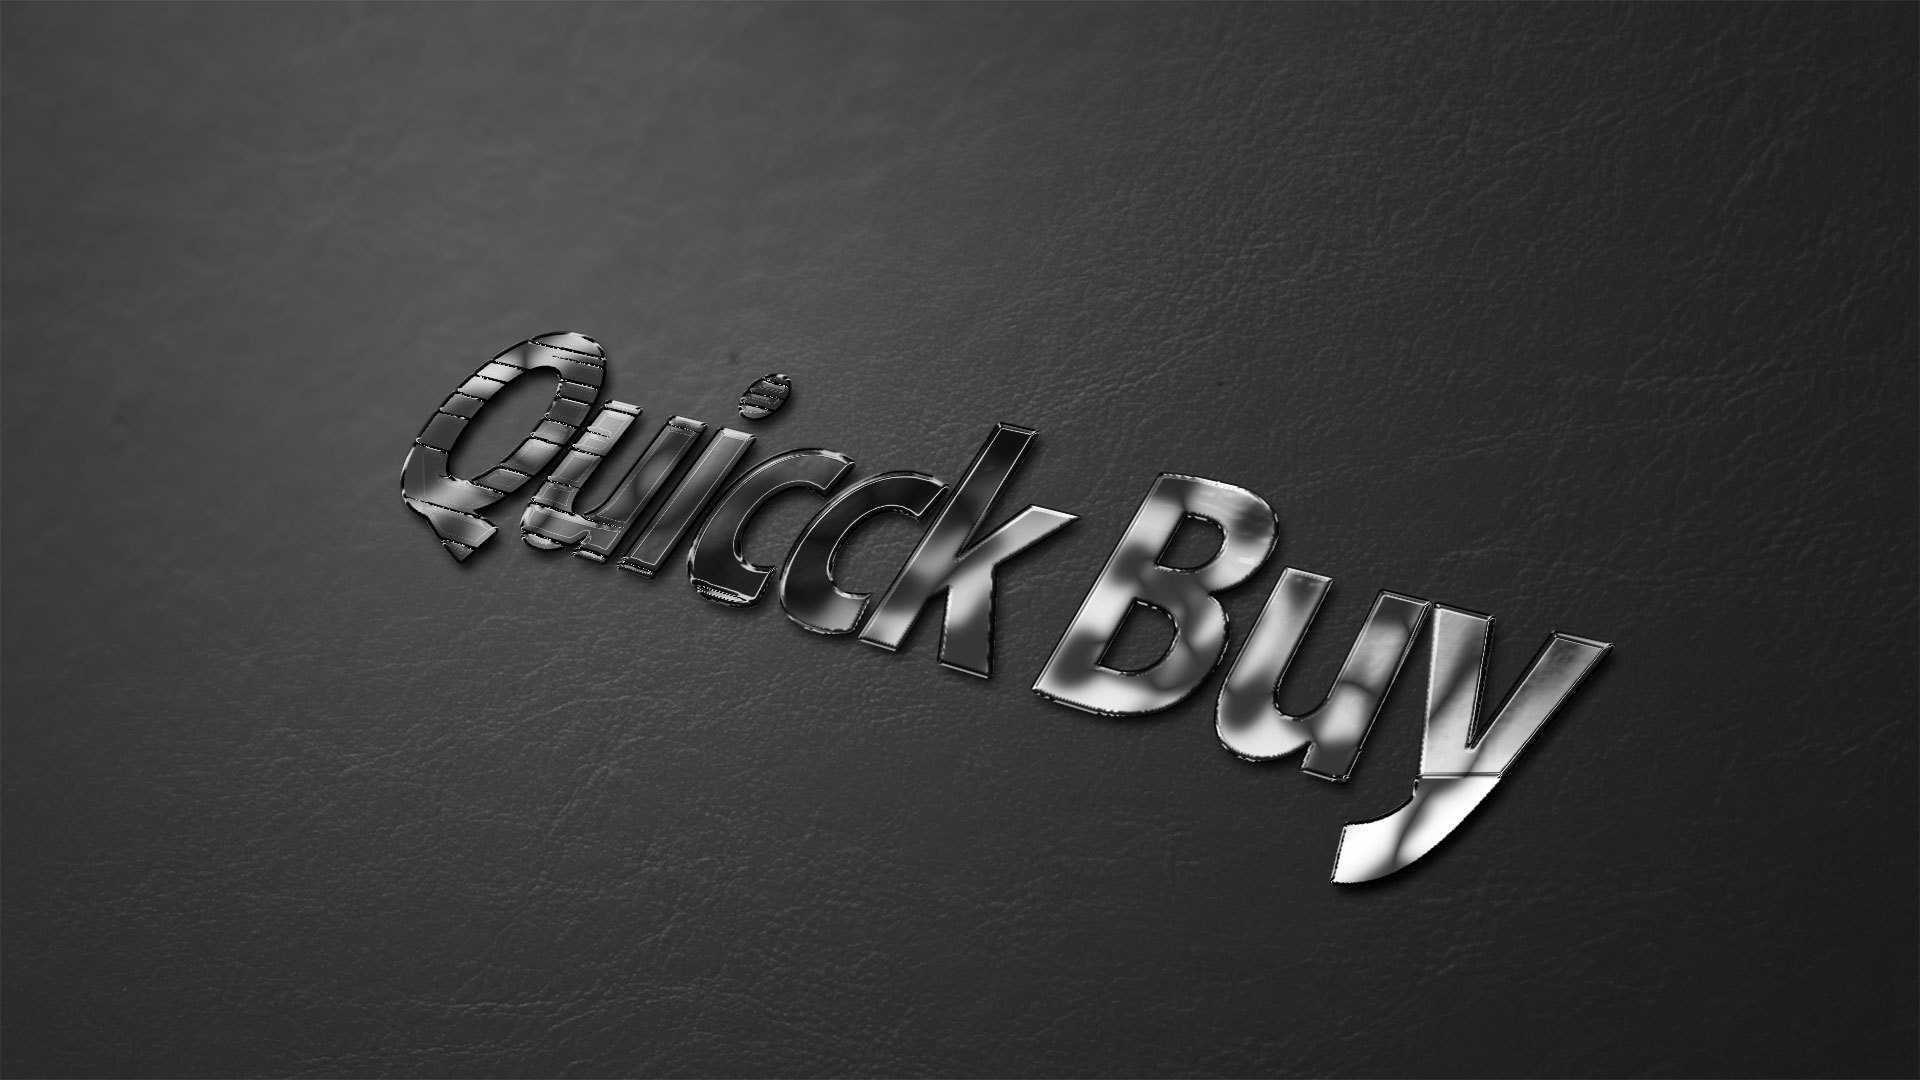 quicckbuy-logo